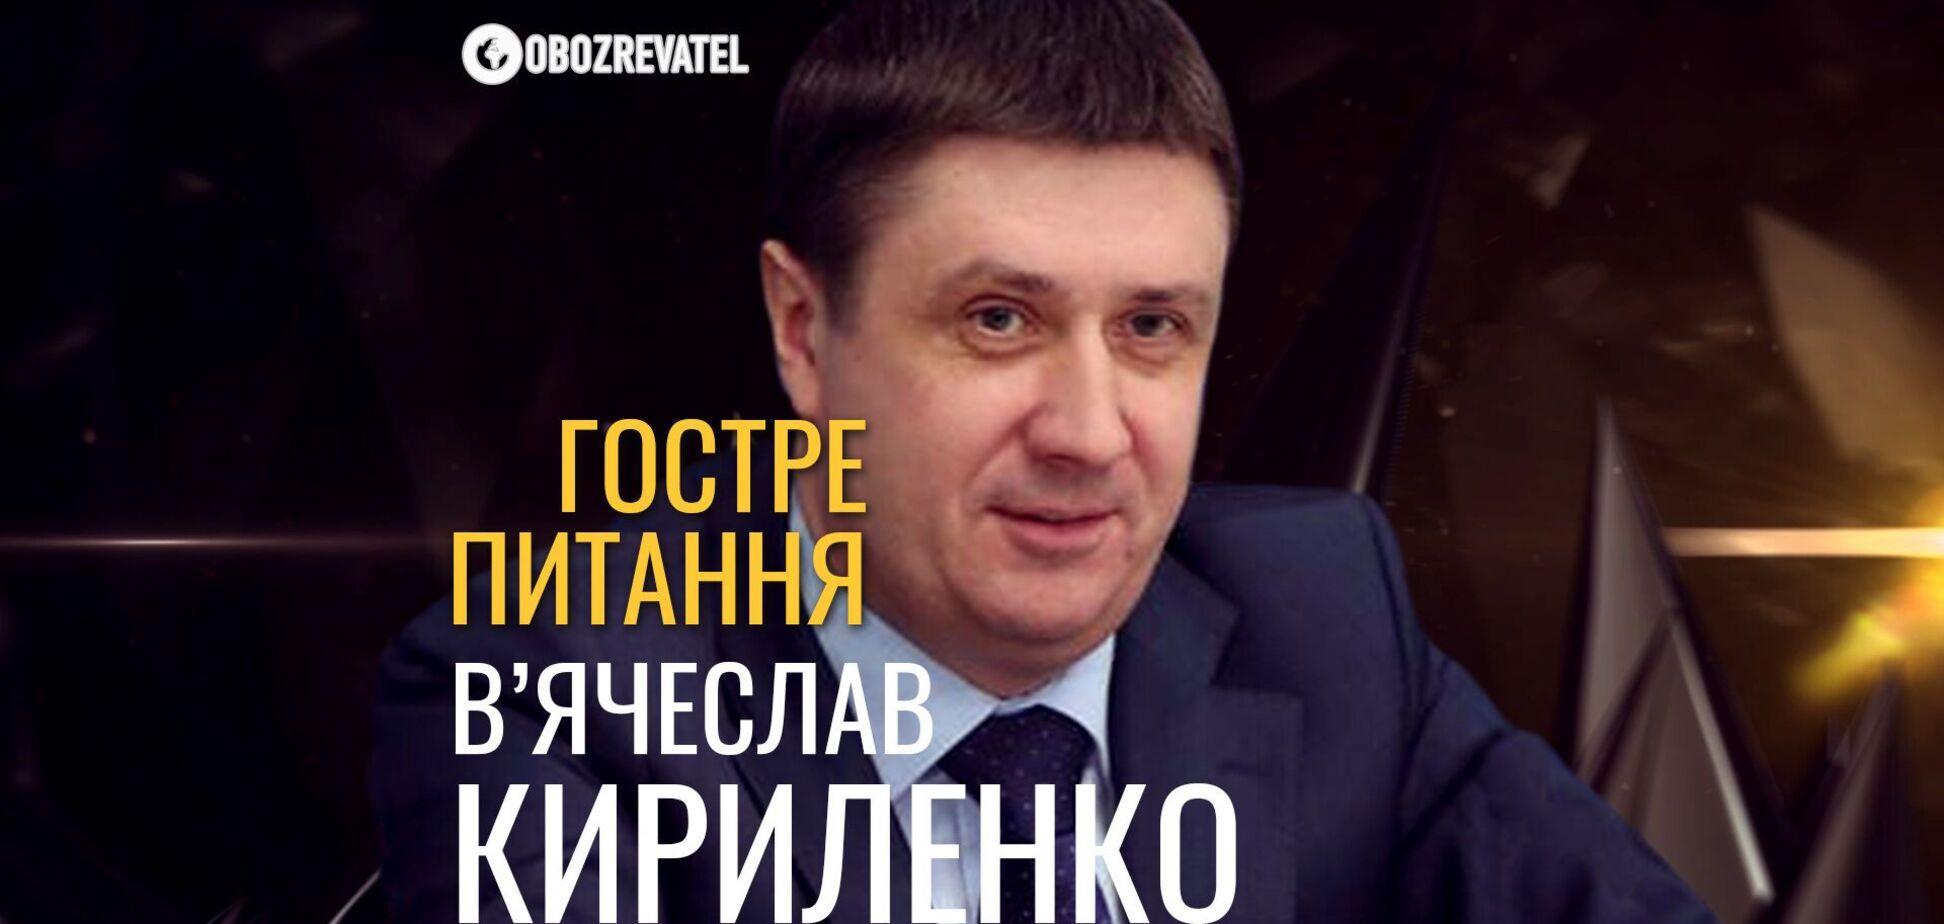 Гостре питання. В'ячеслав Кириленко